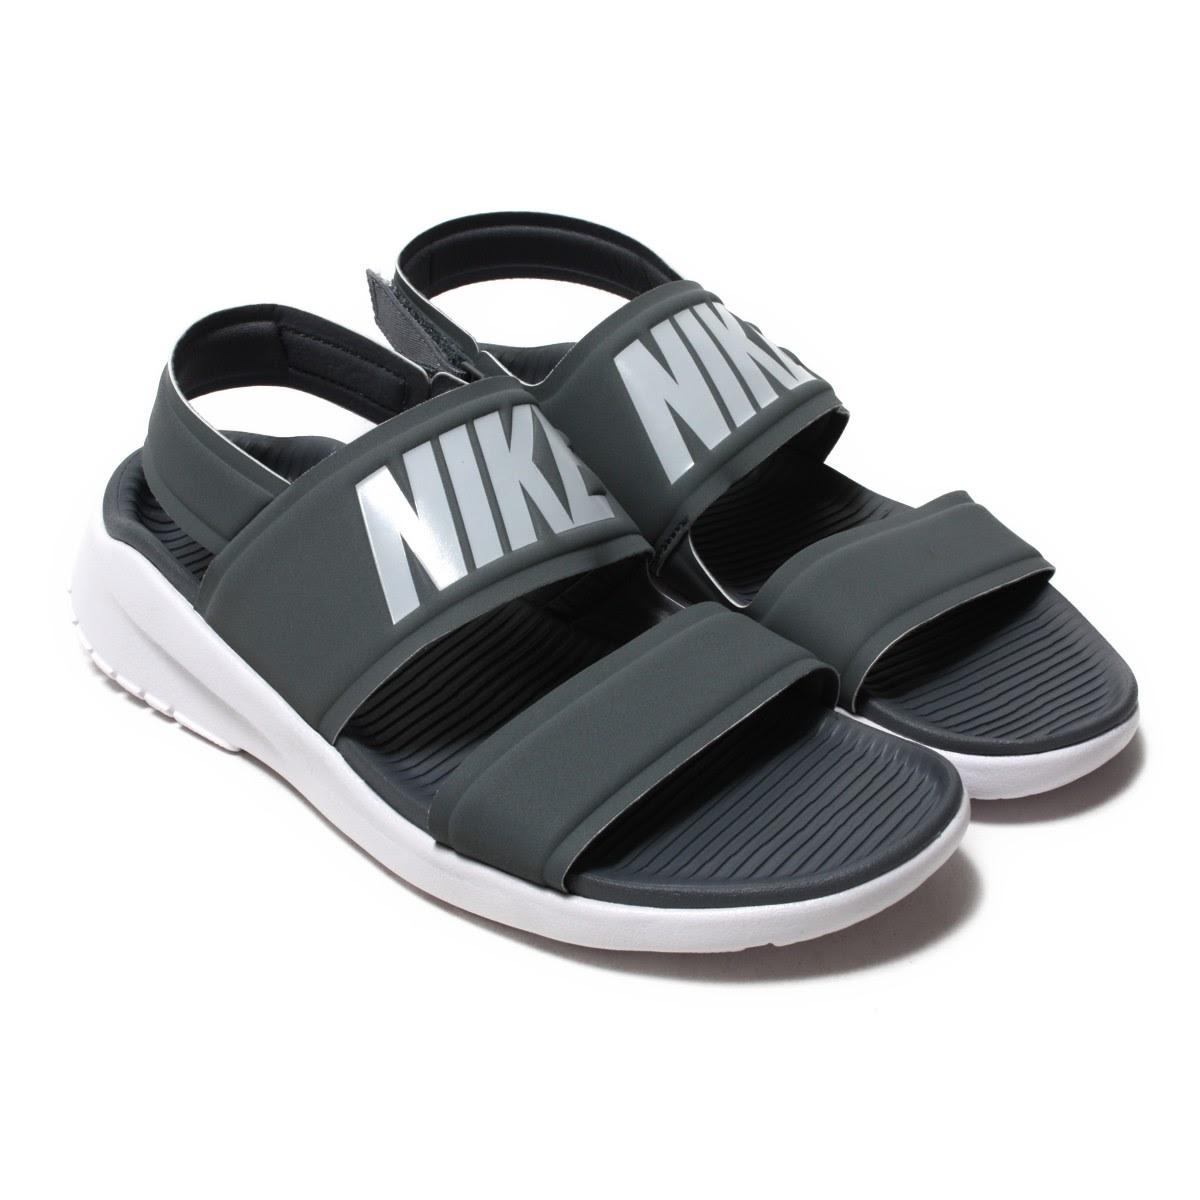 0750dc193de NIKE WMNS TANJUN SANDAL (Nike women tongue Jun sandals) COOL GREY PURE  PLATINUM-WHITE 17FA-I